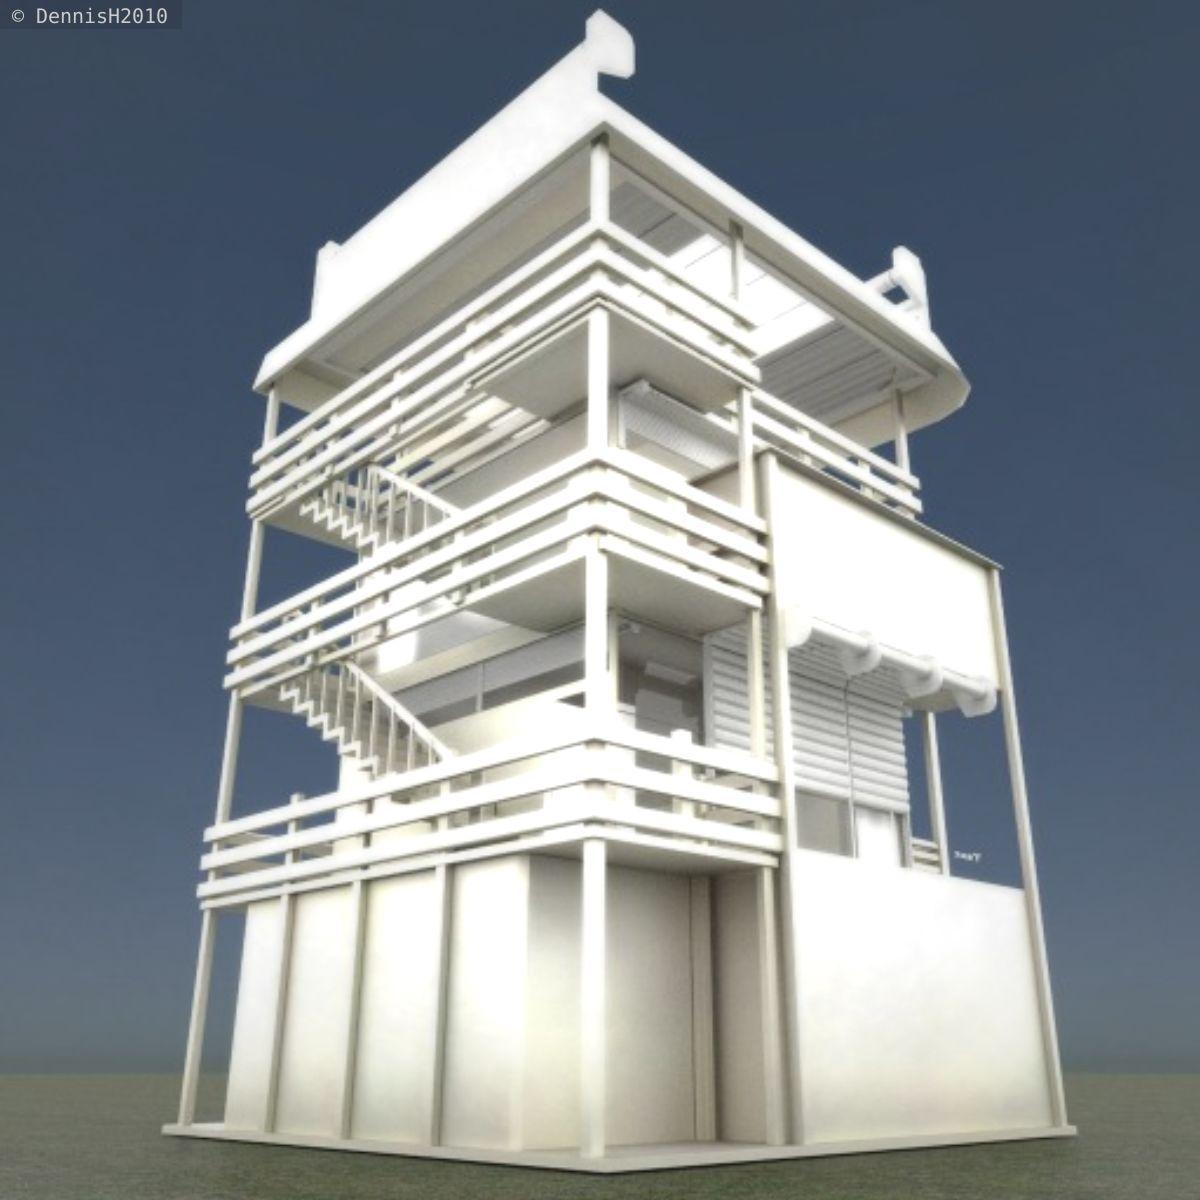 Tower house design blender game engine free vr ar House design games 3d